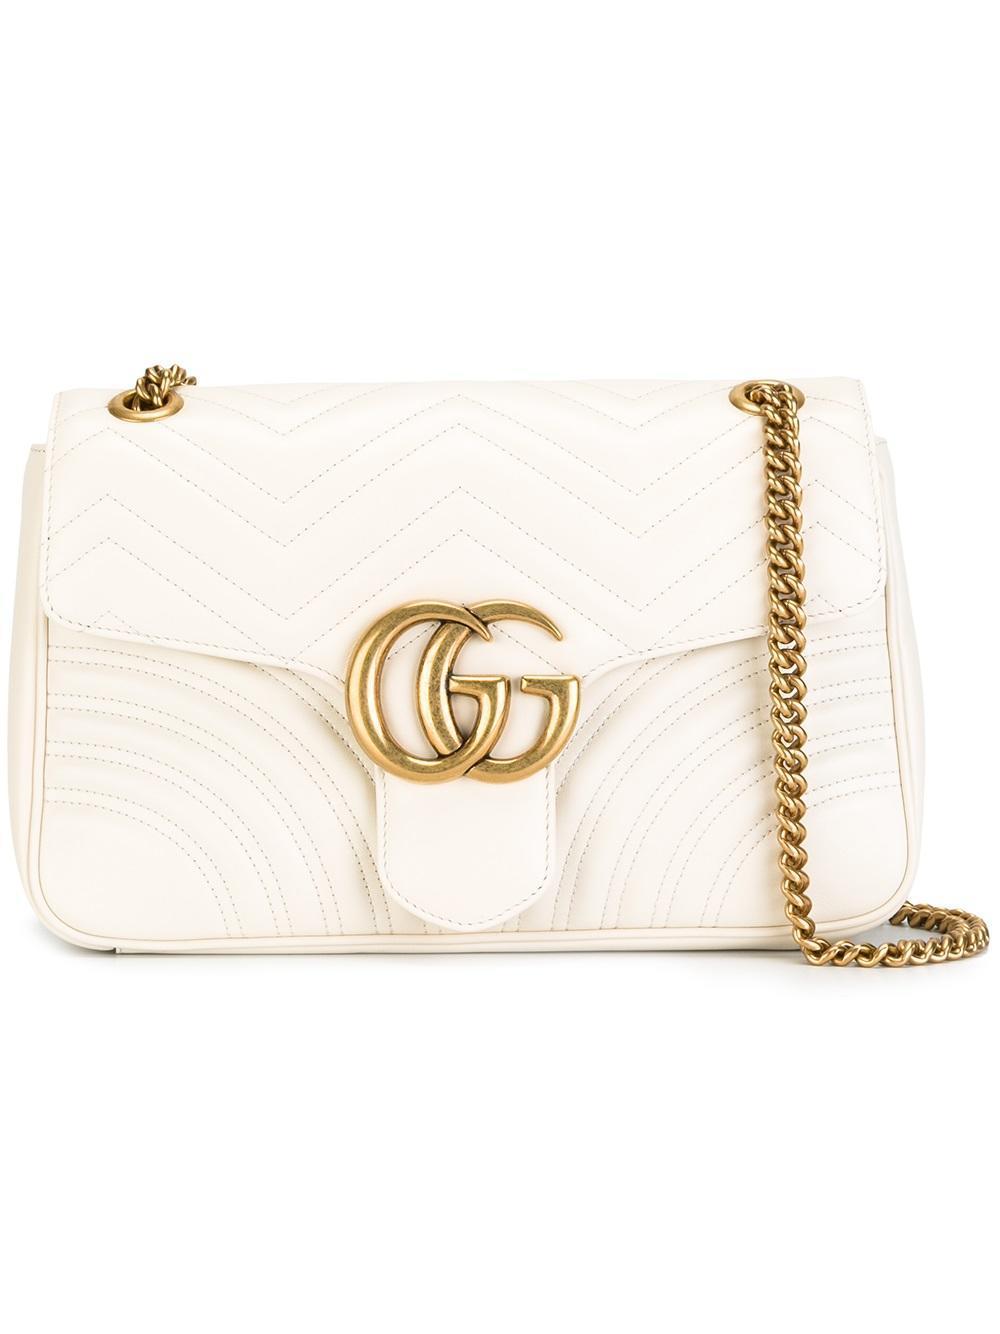 Lyst - Gucci Gg Marmont Matelassé Shoulder Bag in White 8adacdc3bd52e